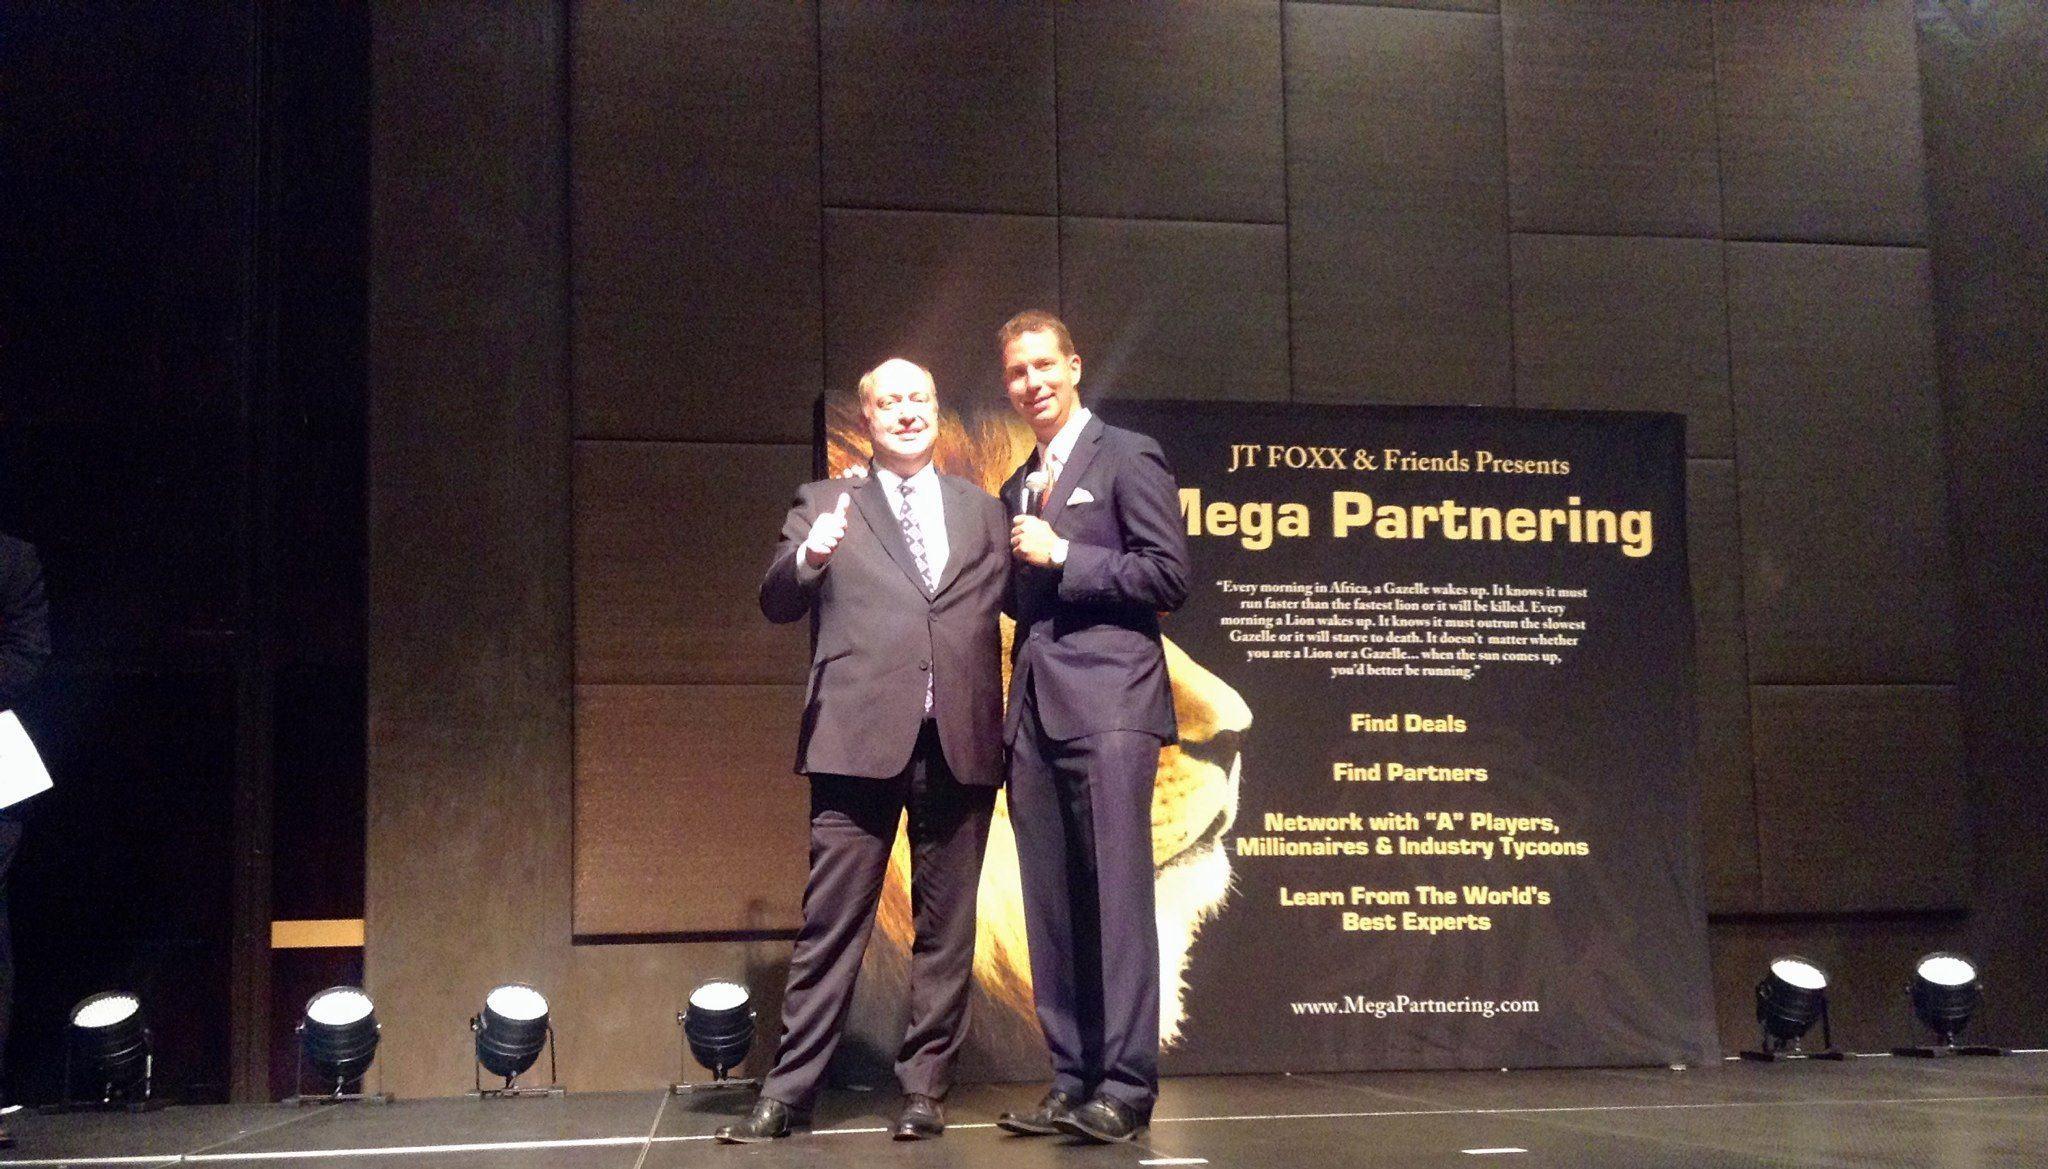 mega-partnering-sj